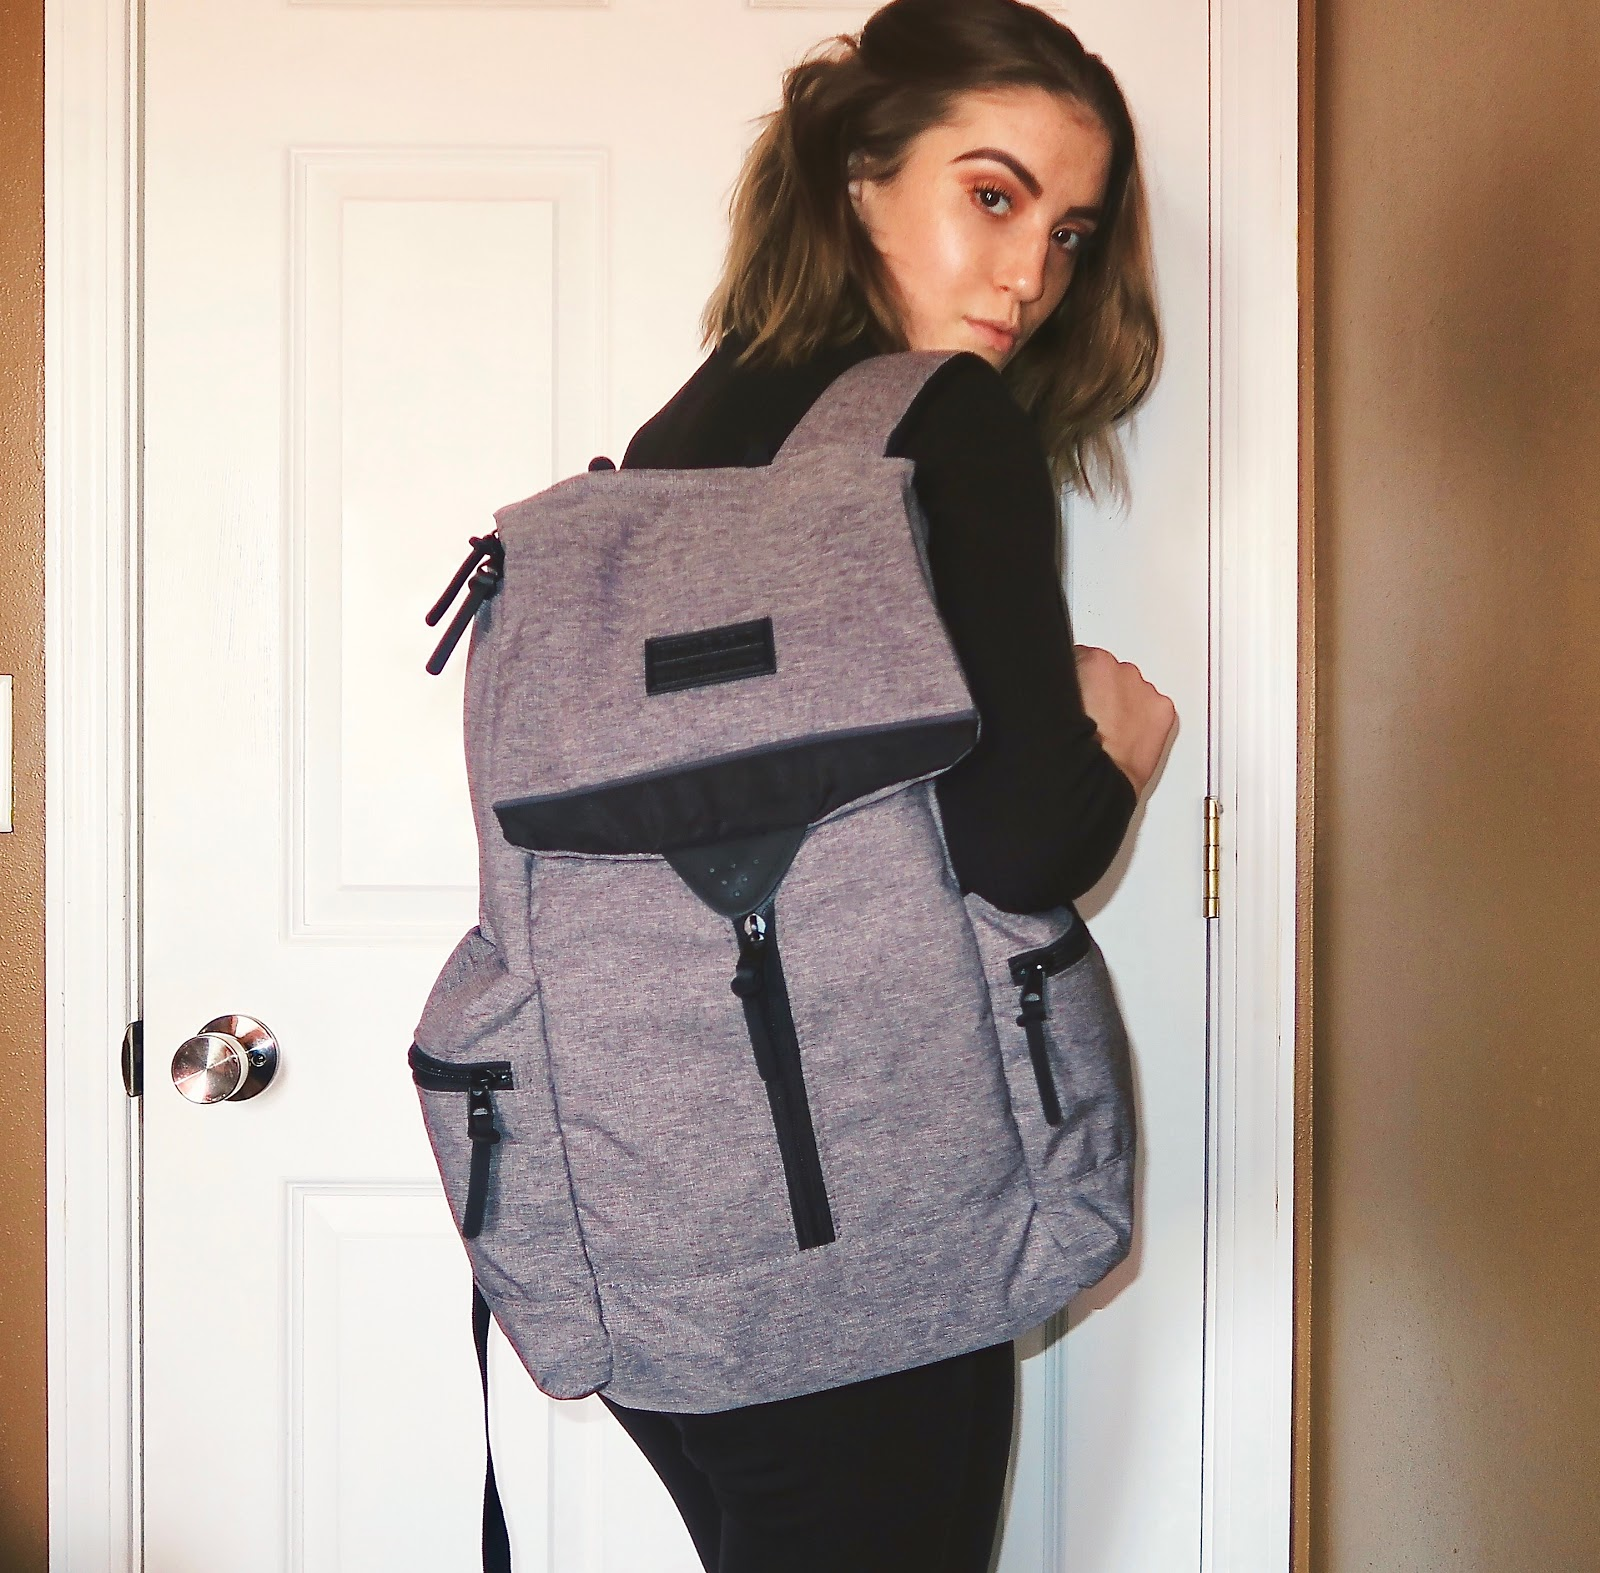 5f7dee5be364 Jordan Lampe  My New Backpack